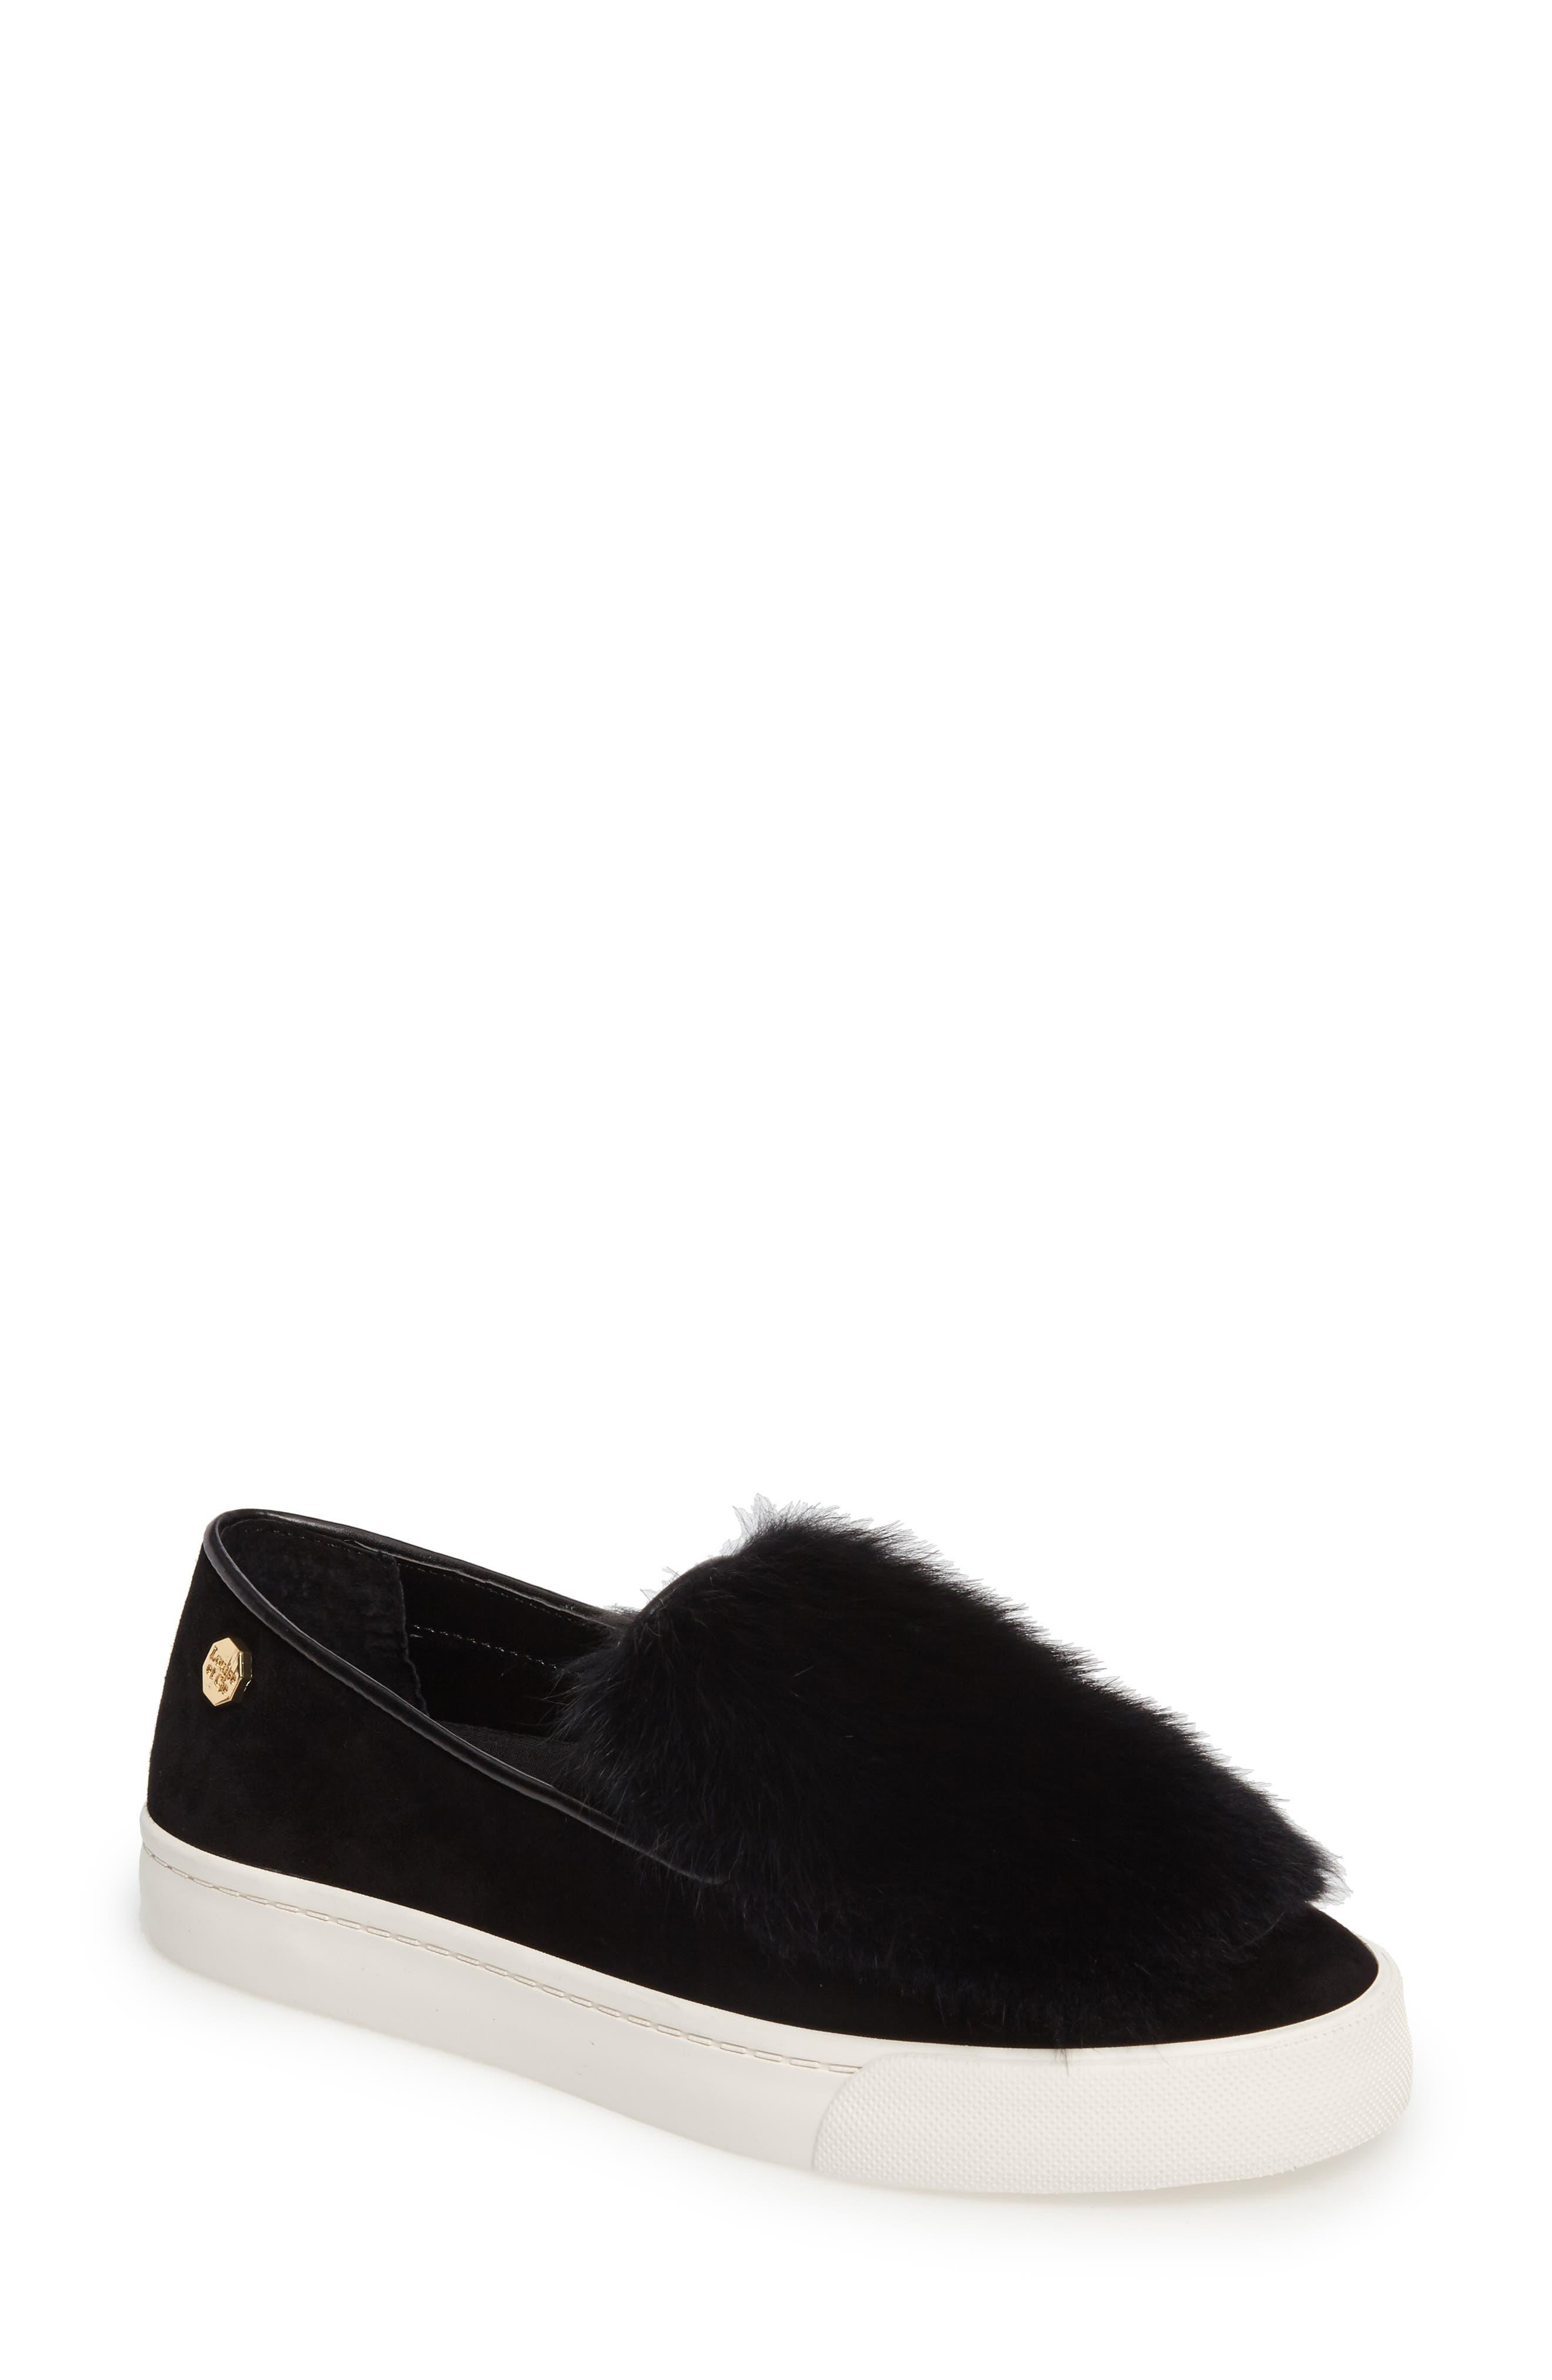 Bershner Genuine Rabbit Fur Slip-On Sneaker,                             Main thumbnail 1, color,                             001